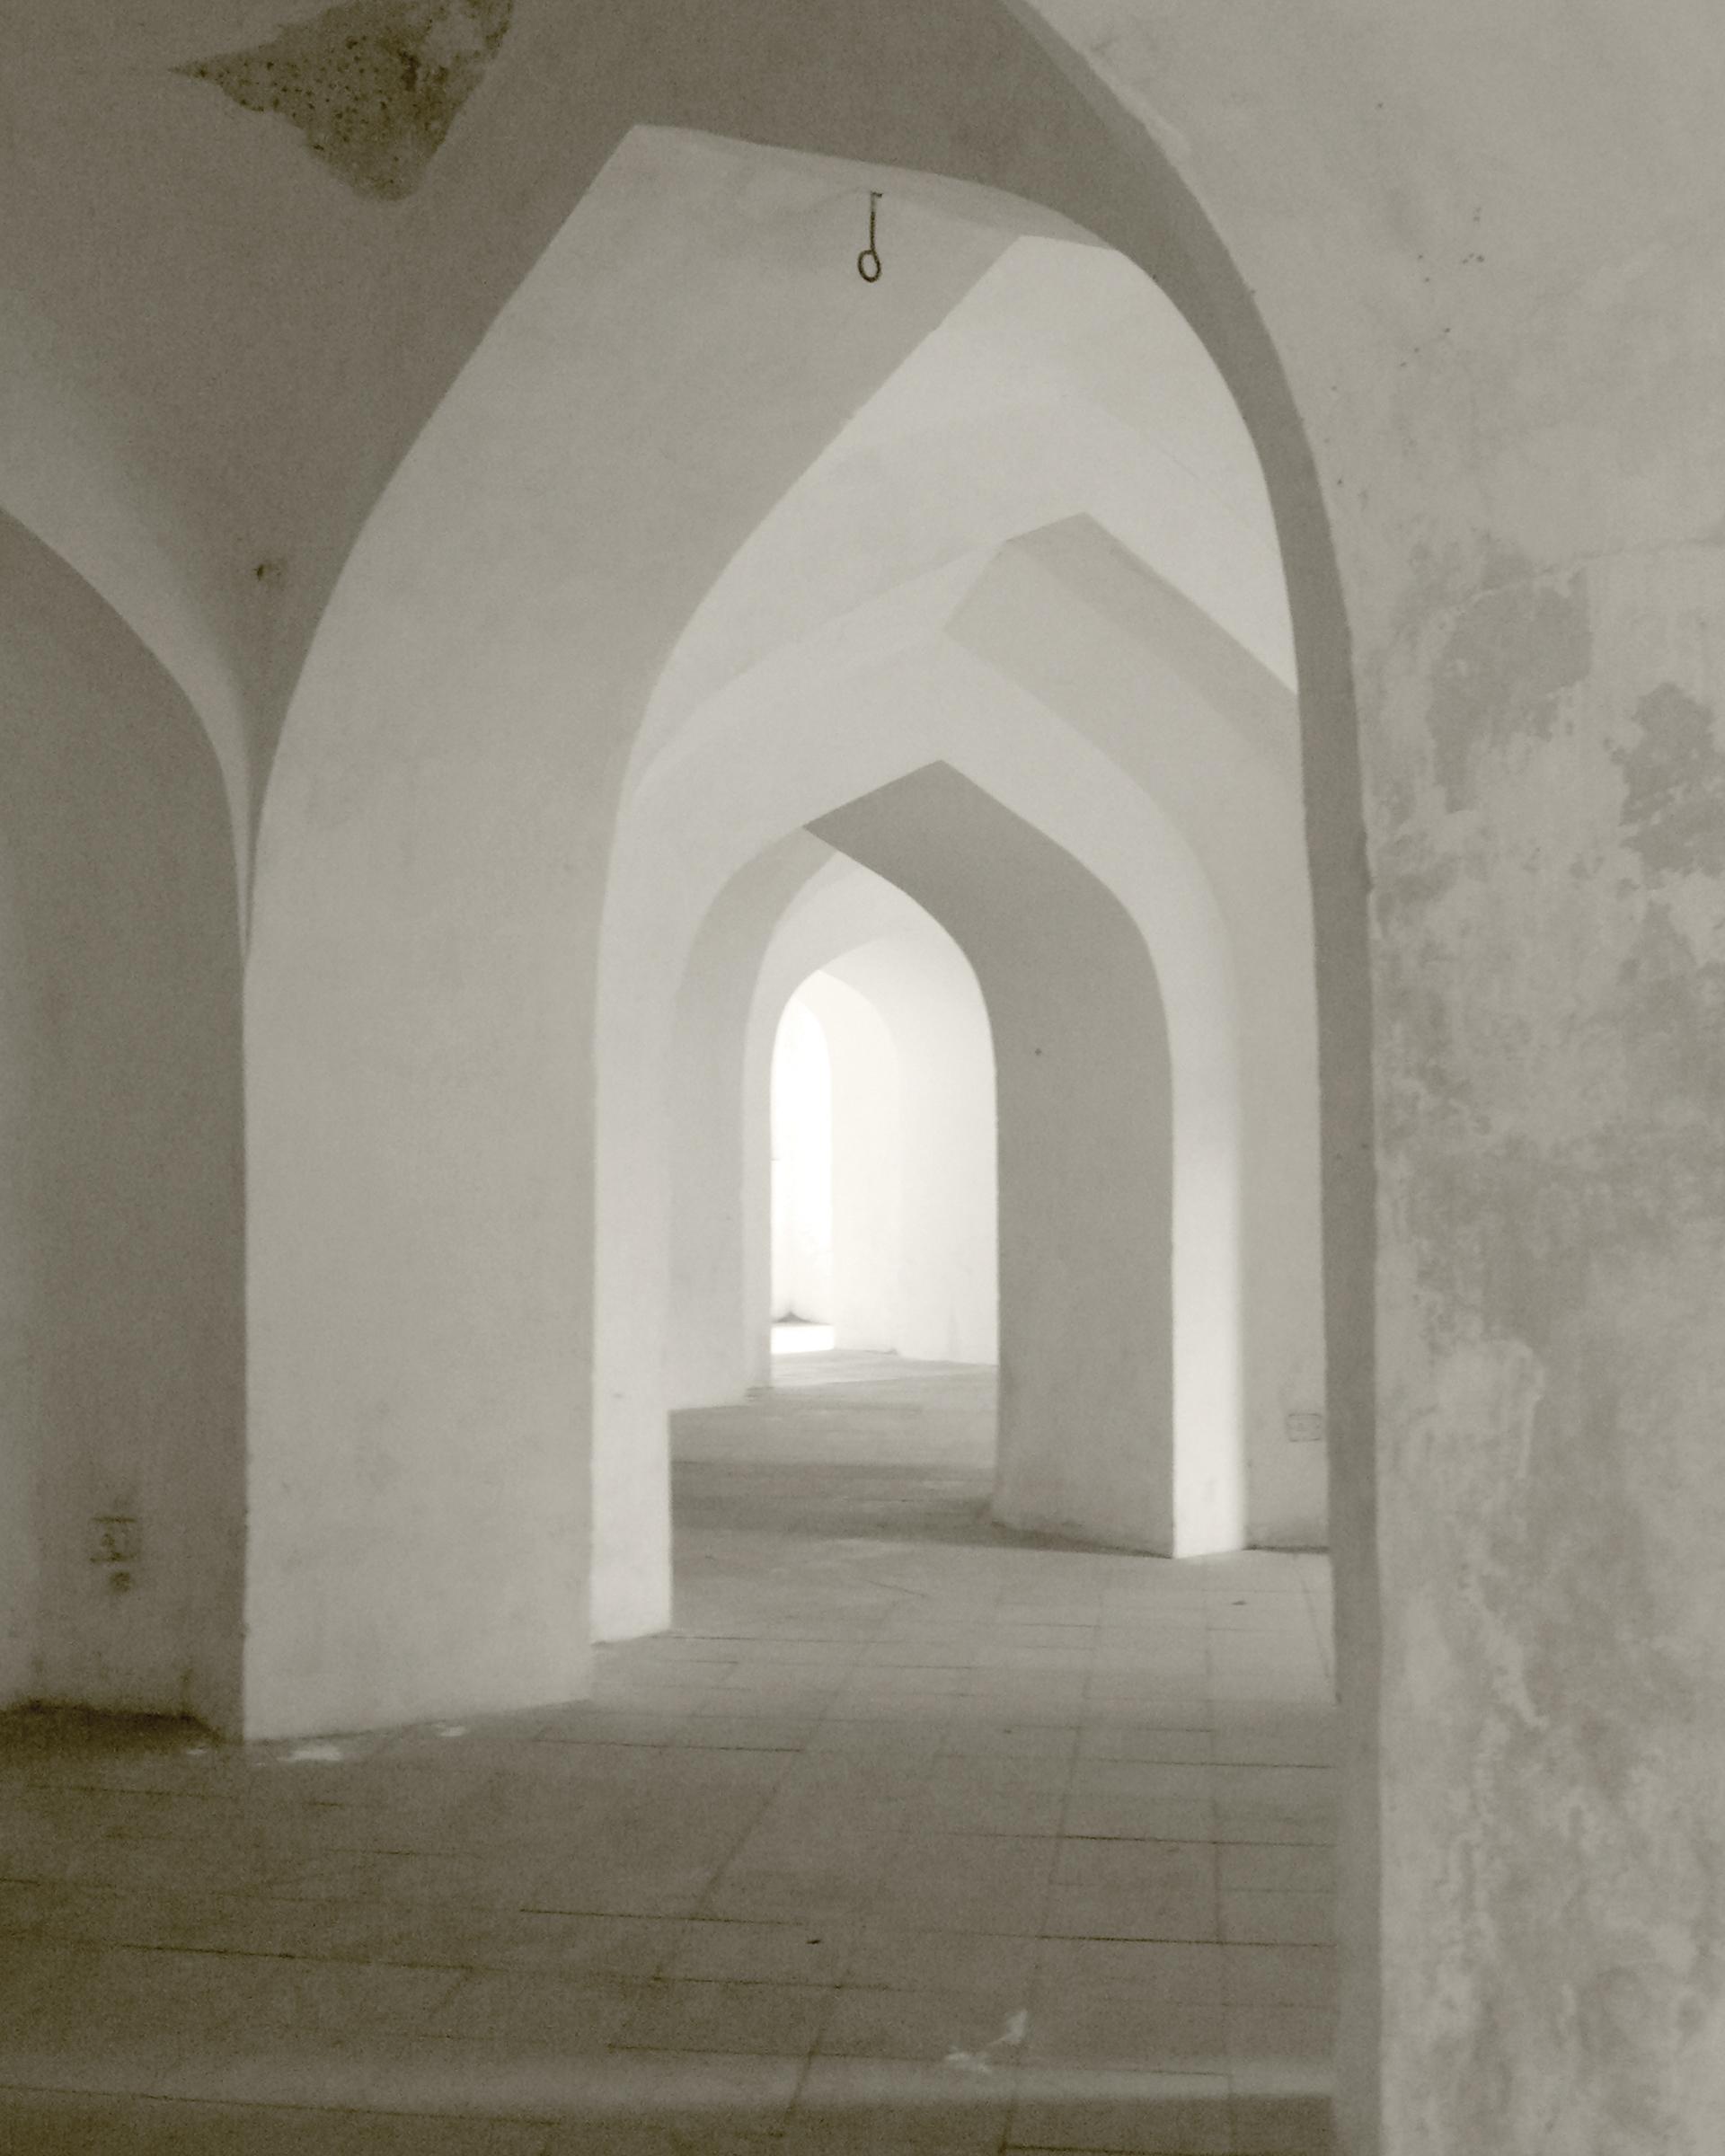 "Anthea Baxter-Page, Archways, Jaipur, 2012. Archival digital print, 30 x 24""."